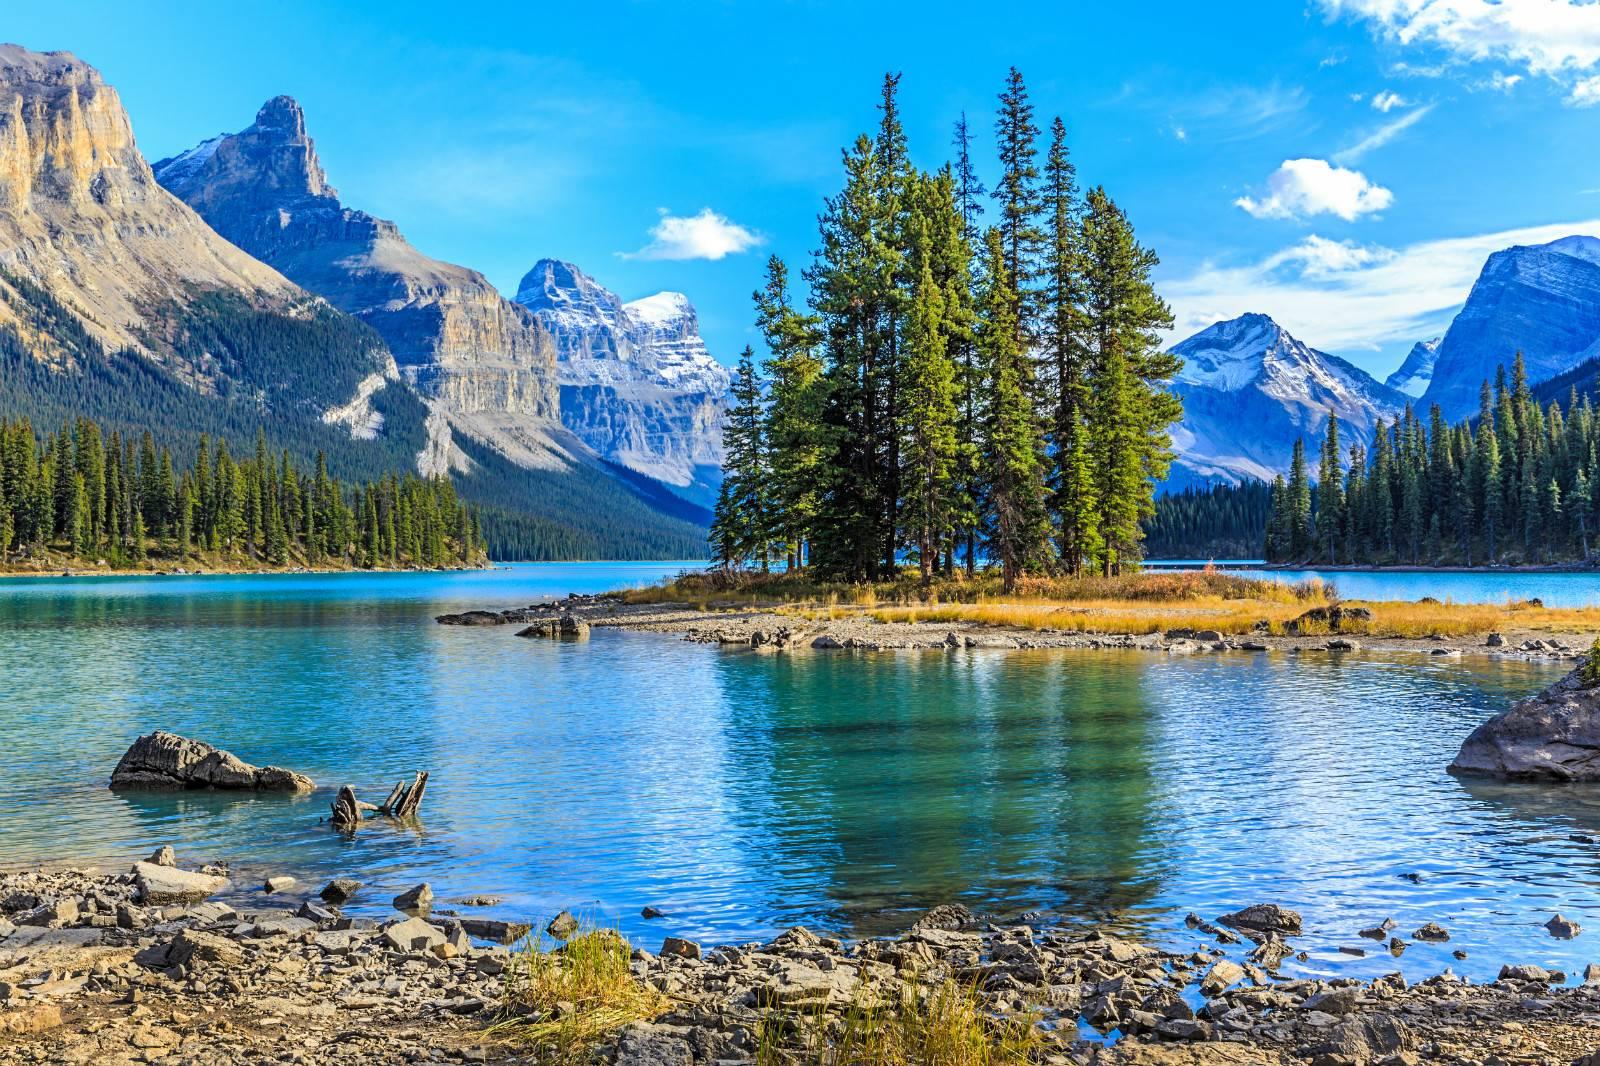 5-Day Calgary to Jasper, Maligne Lake, Lake Louise & National Park, Columbia Icefield, Vancouver